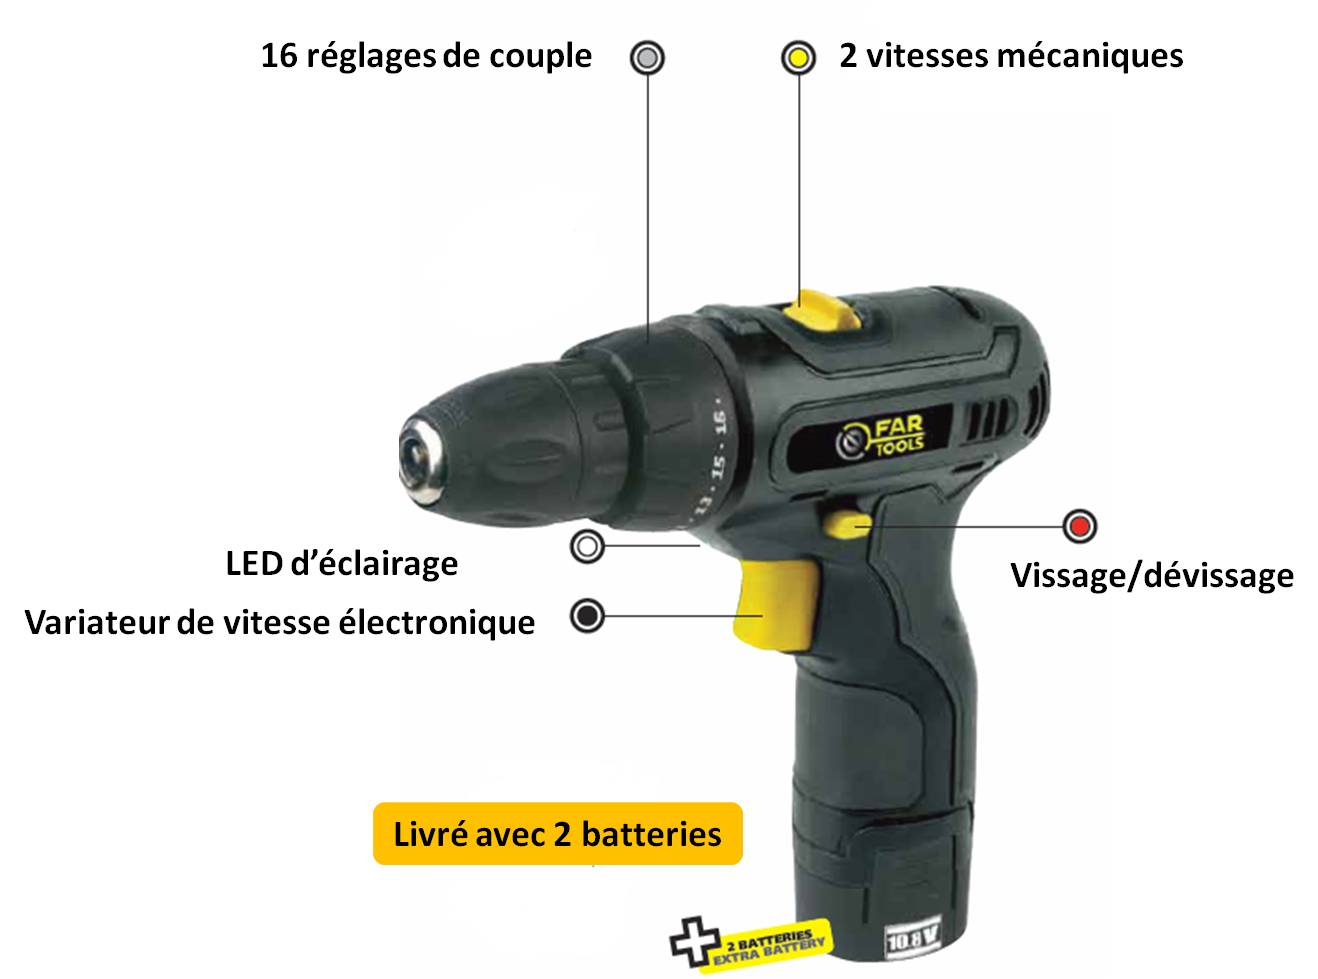 Visseuse sans fil 2 batteries li ion fartools li10 215411 - Visseuse devisseuse sans fil ...